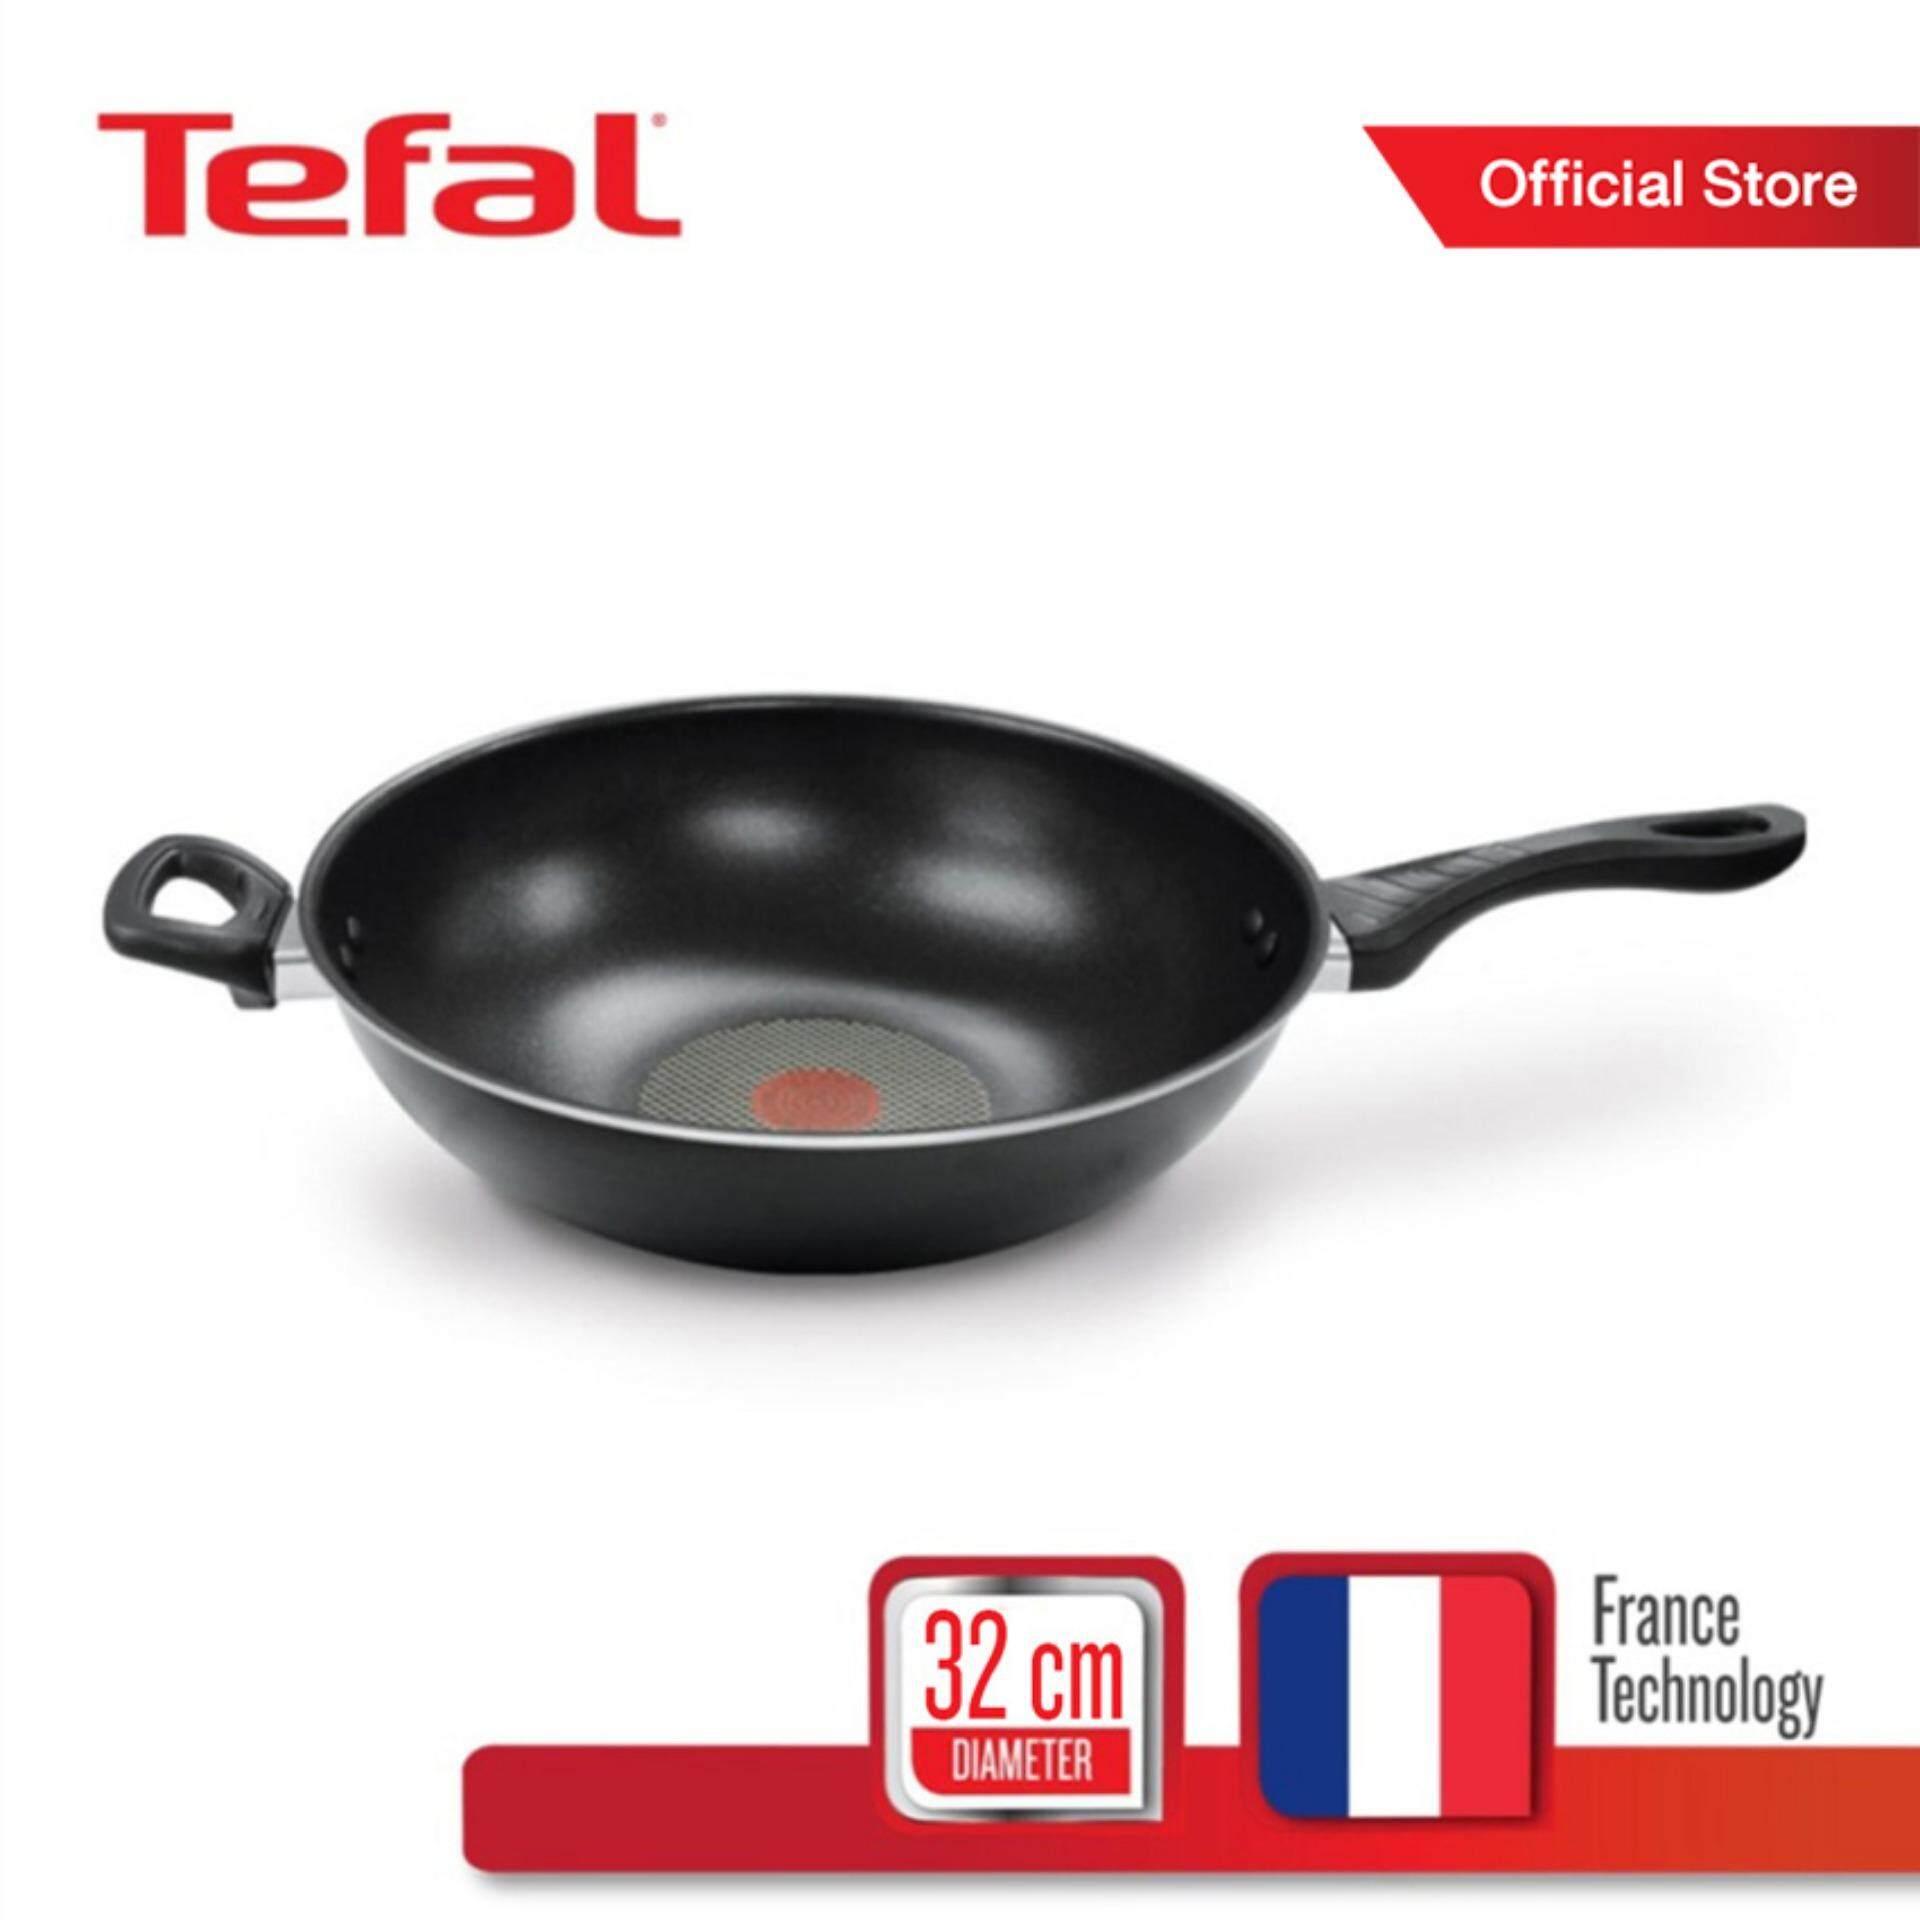 Tefal กระทะก้นลึก 32 ซม. รุ่น Classic A7069814.